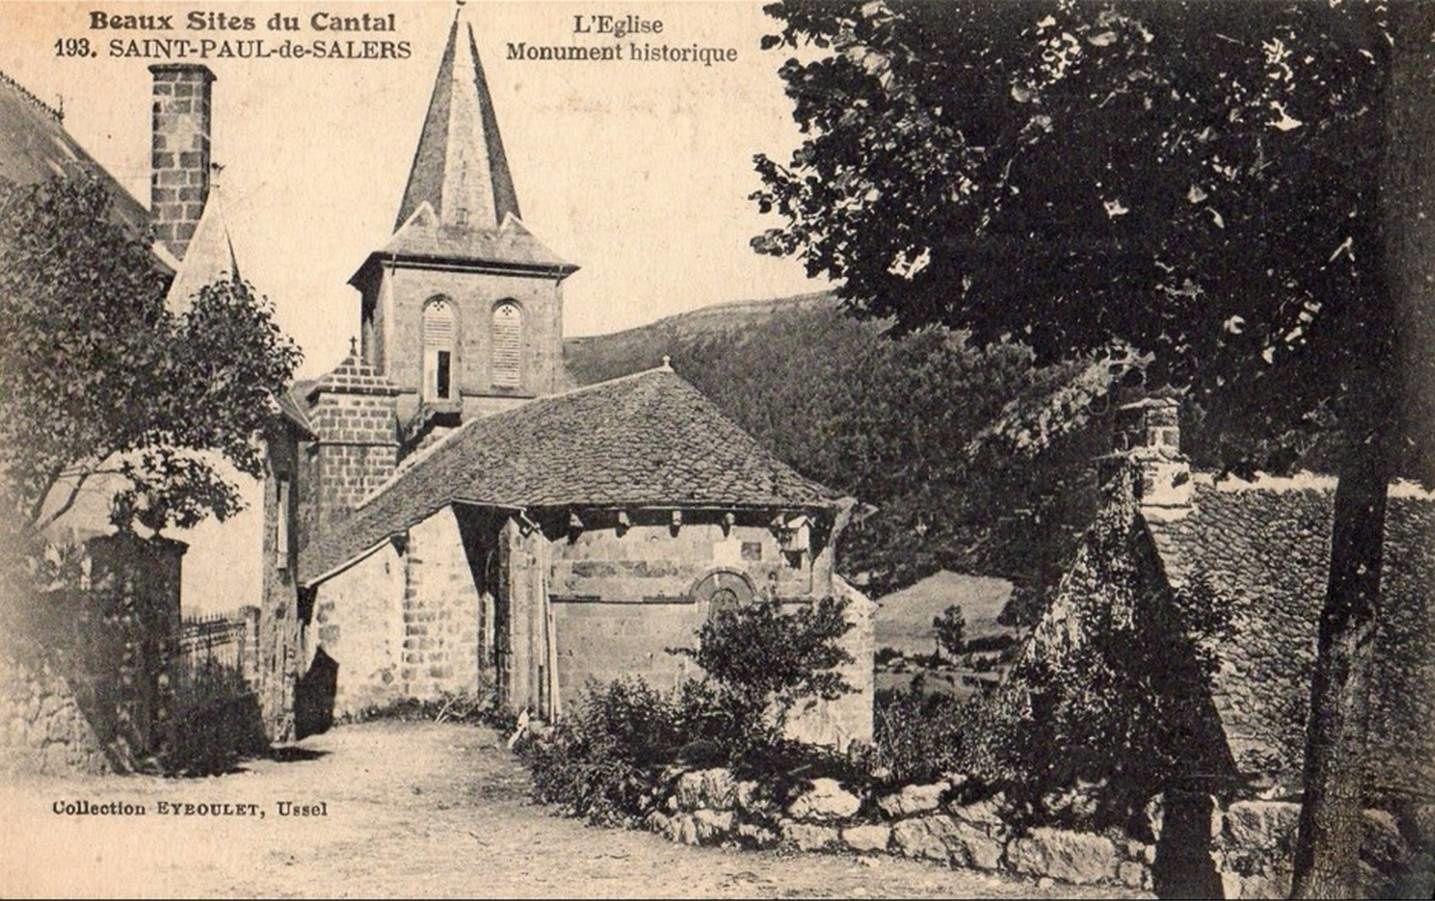 Saint Paul de Salers